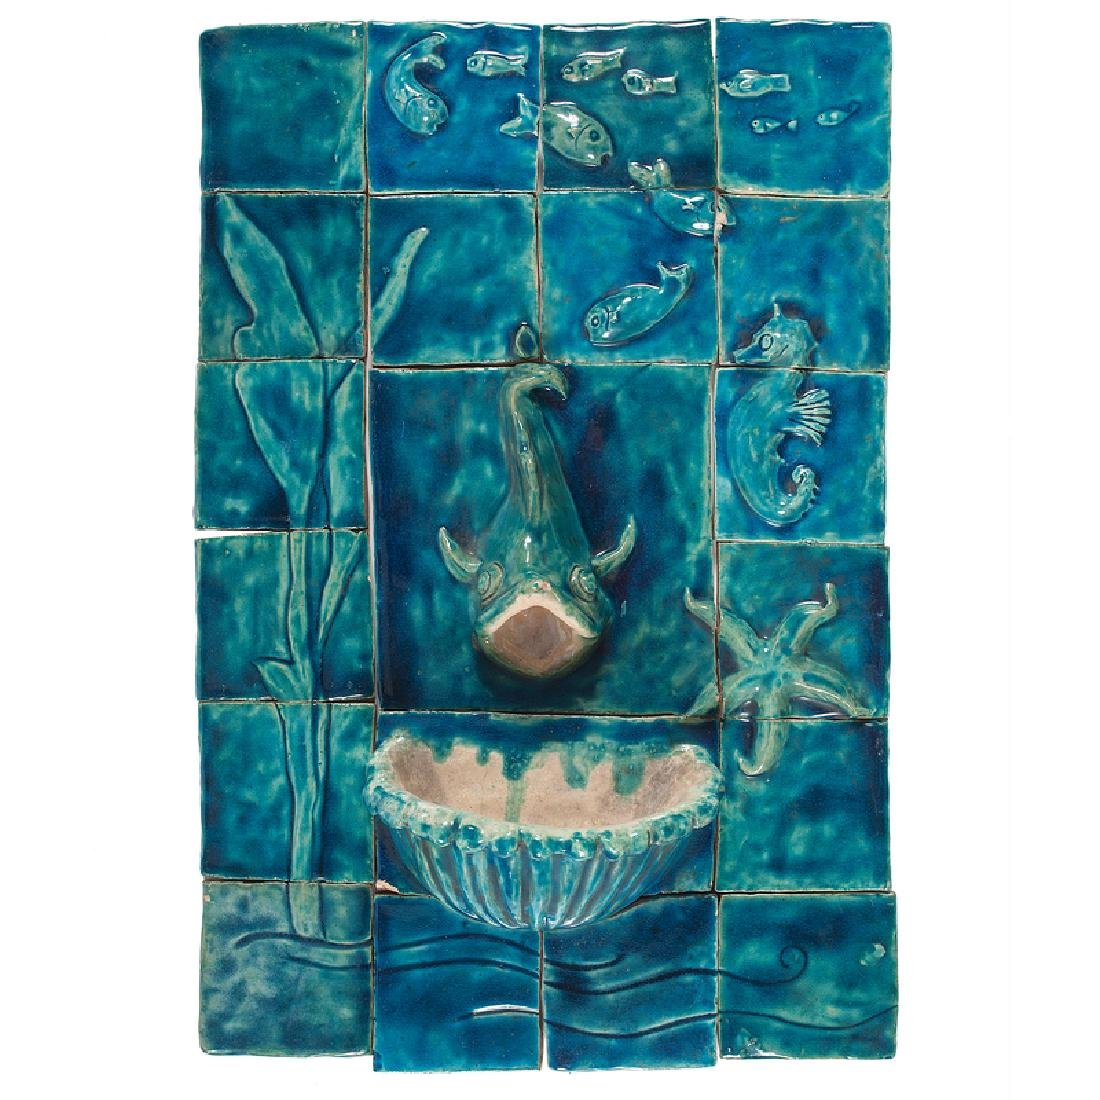 Ceramic Tile Wall Fountain by Ida Carmichael